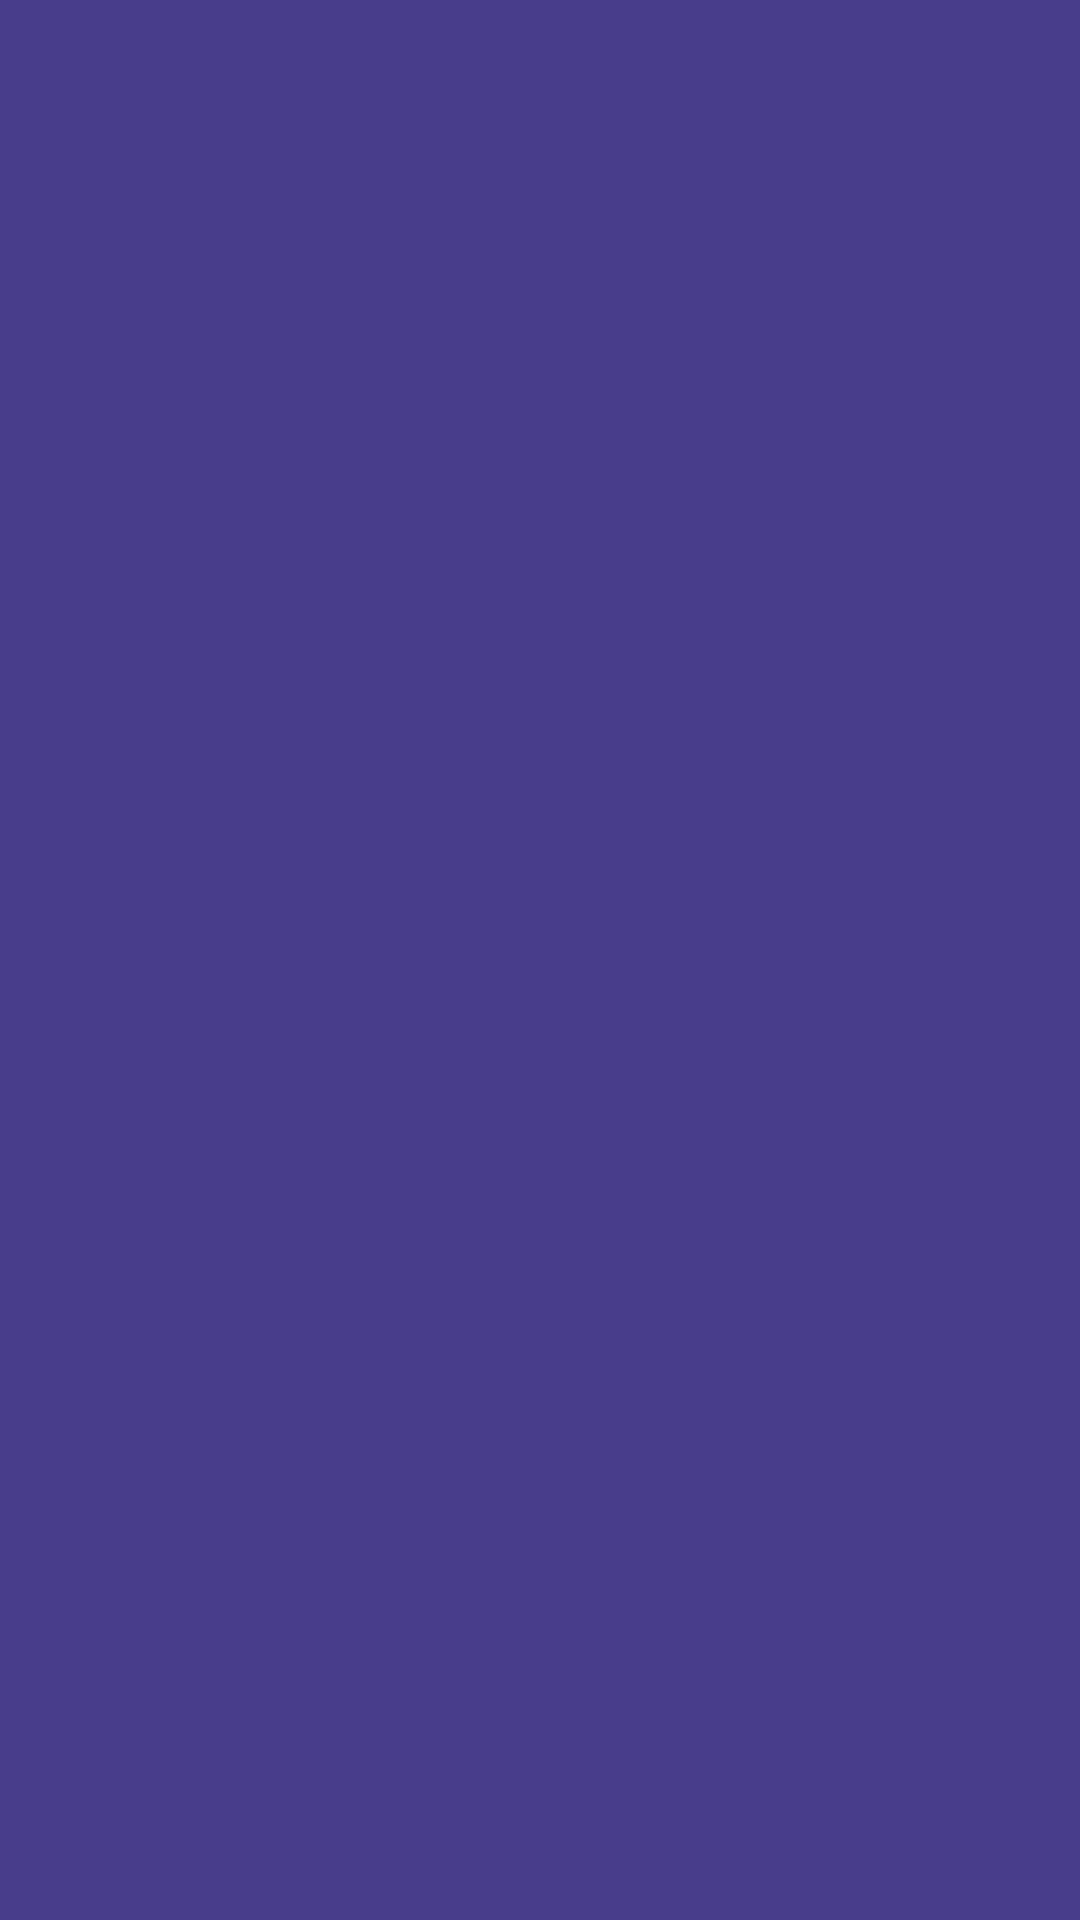 1080x1920 Dark Slate Blue Solid Color Background